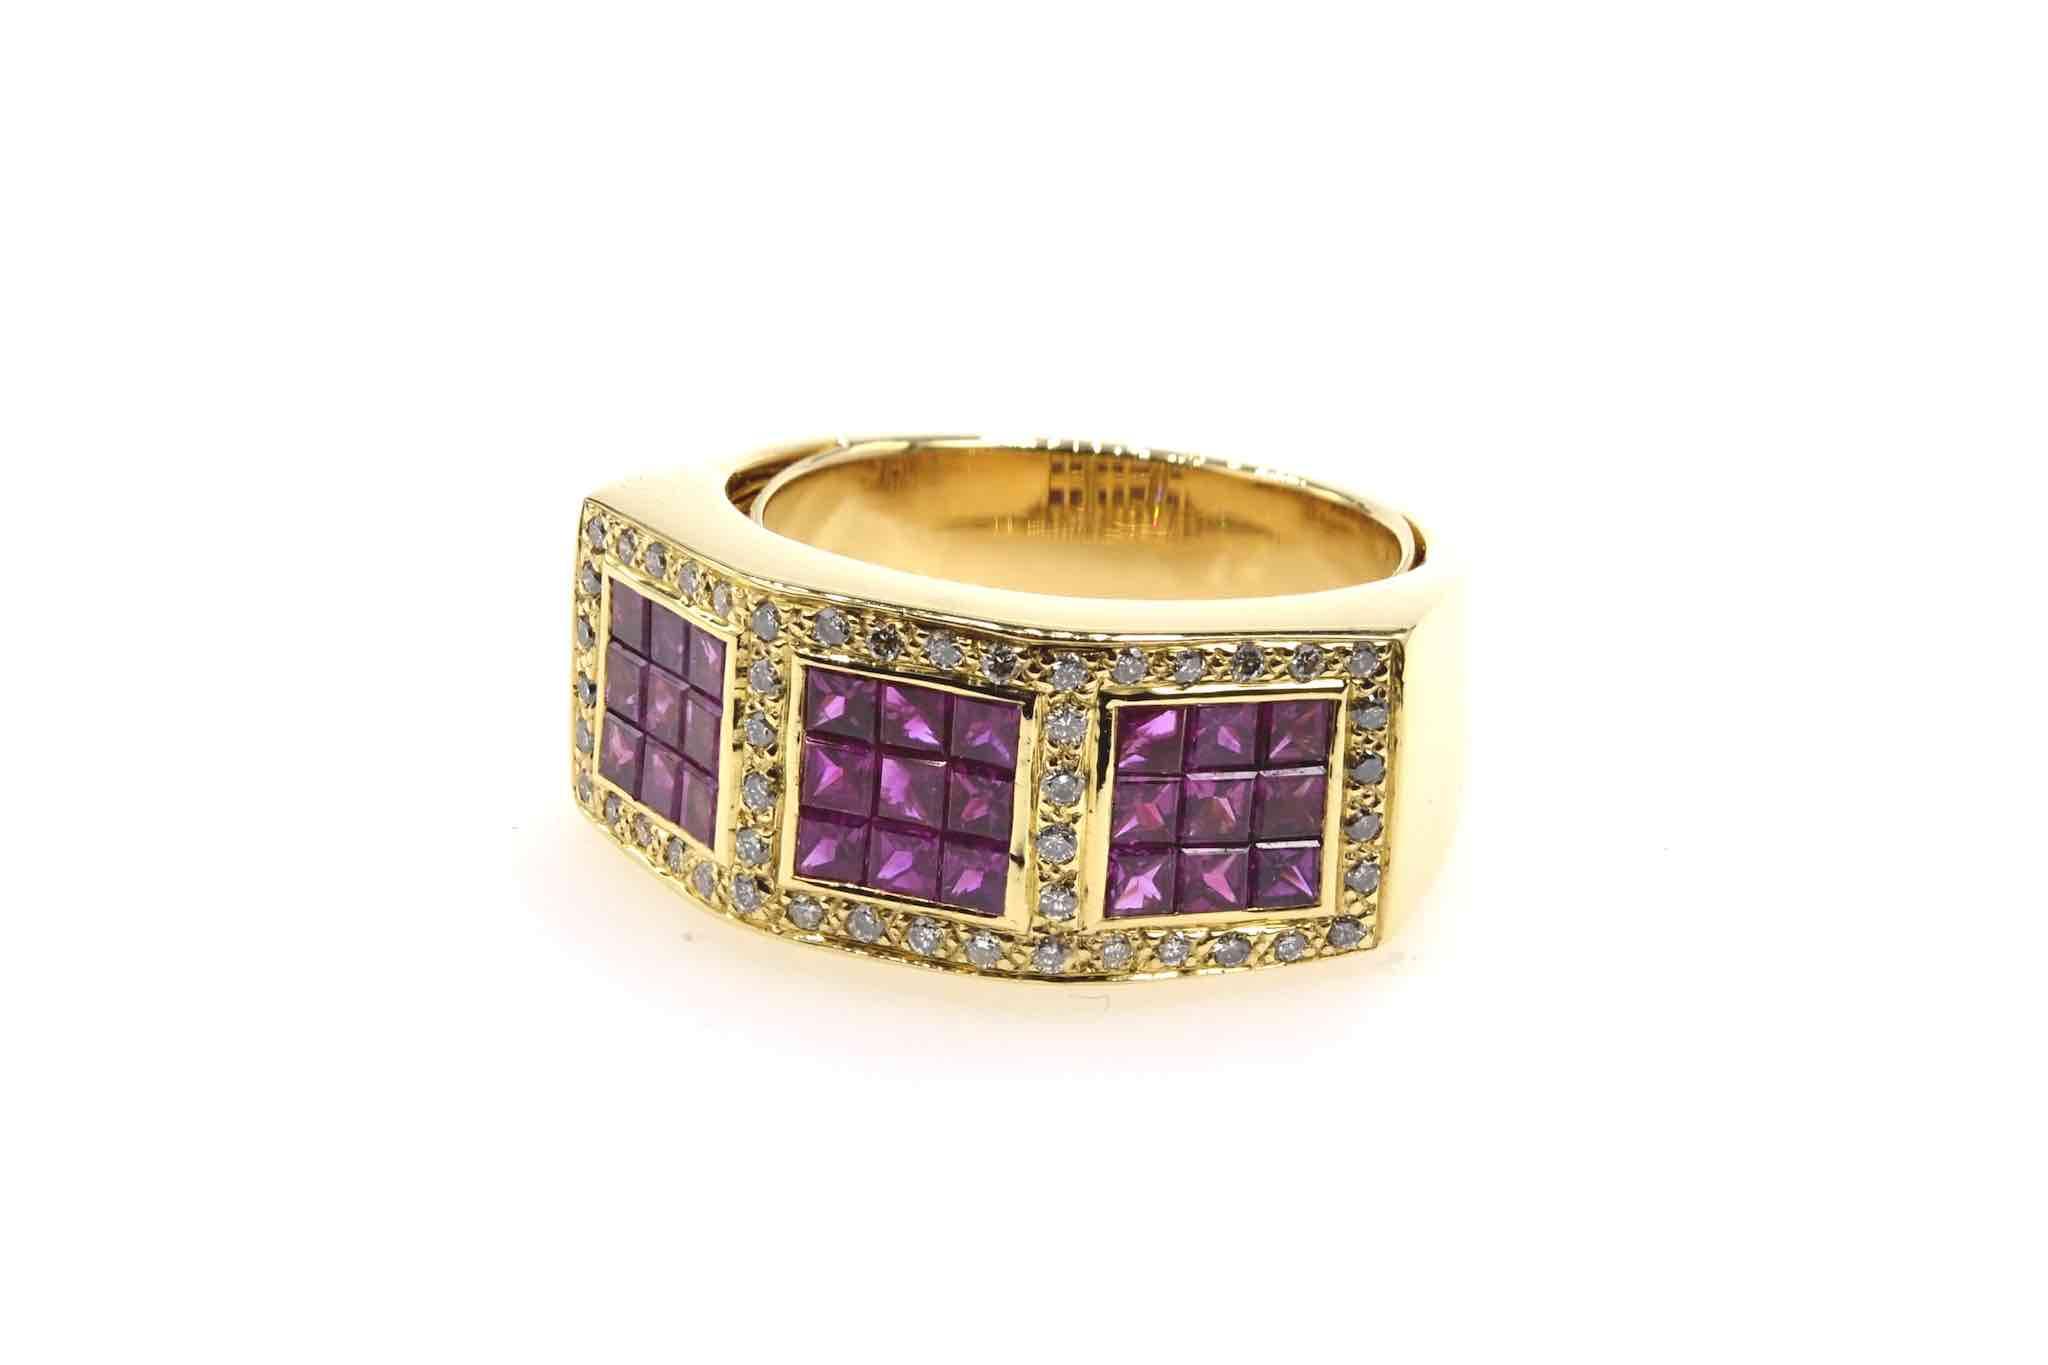 bague rubis et diamants en or jaune 18k